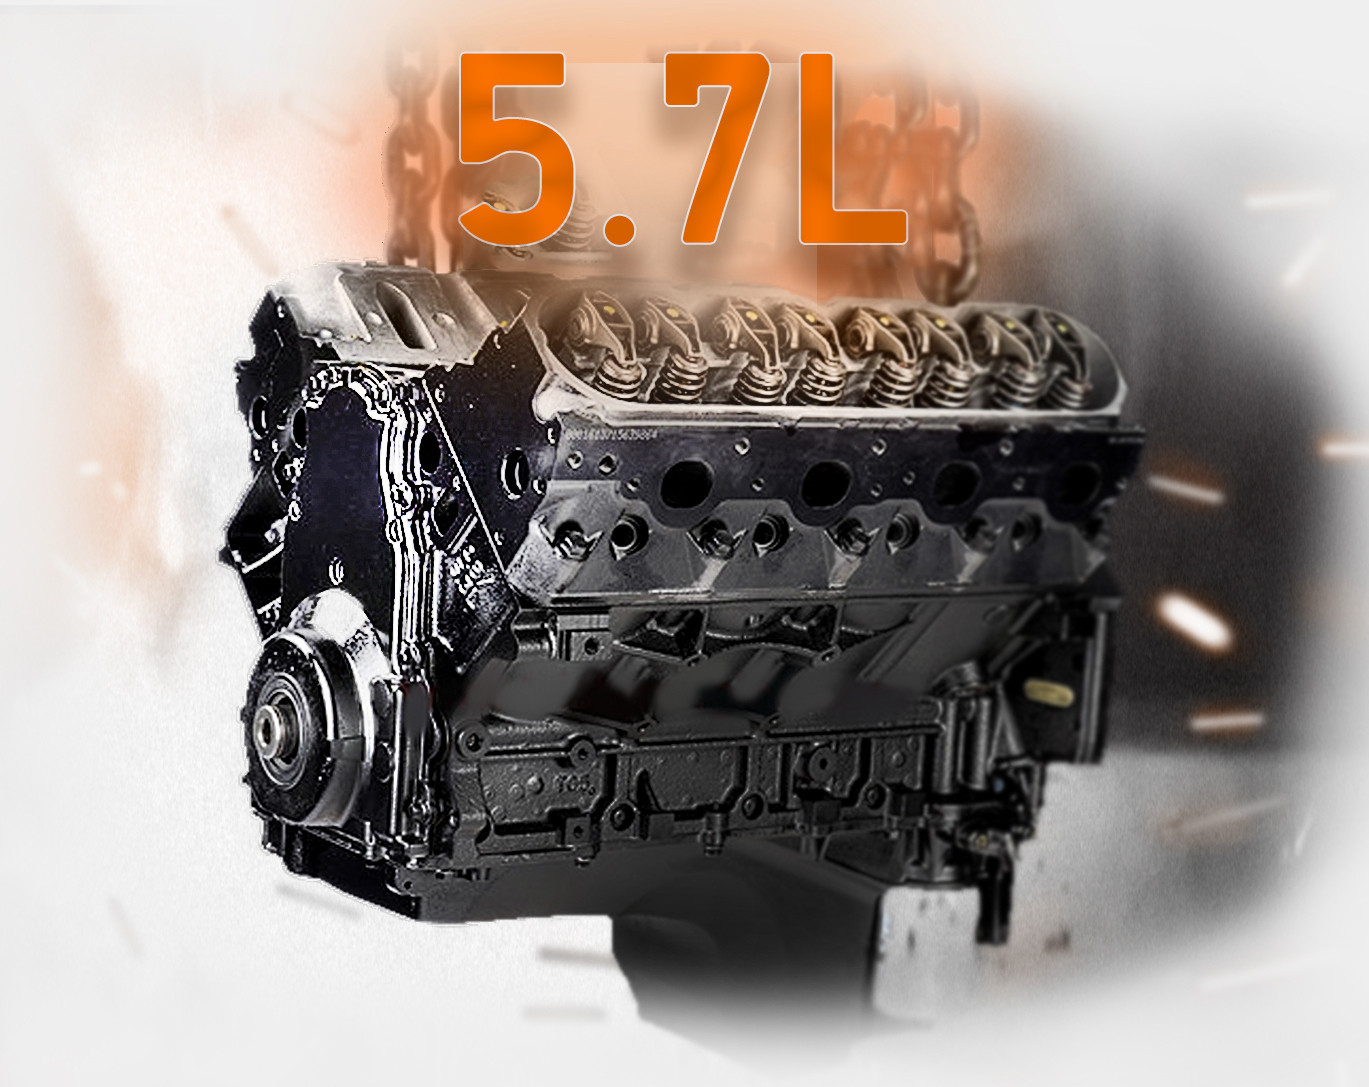 gm rebuilt engines